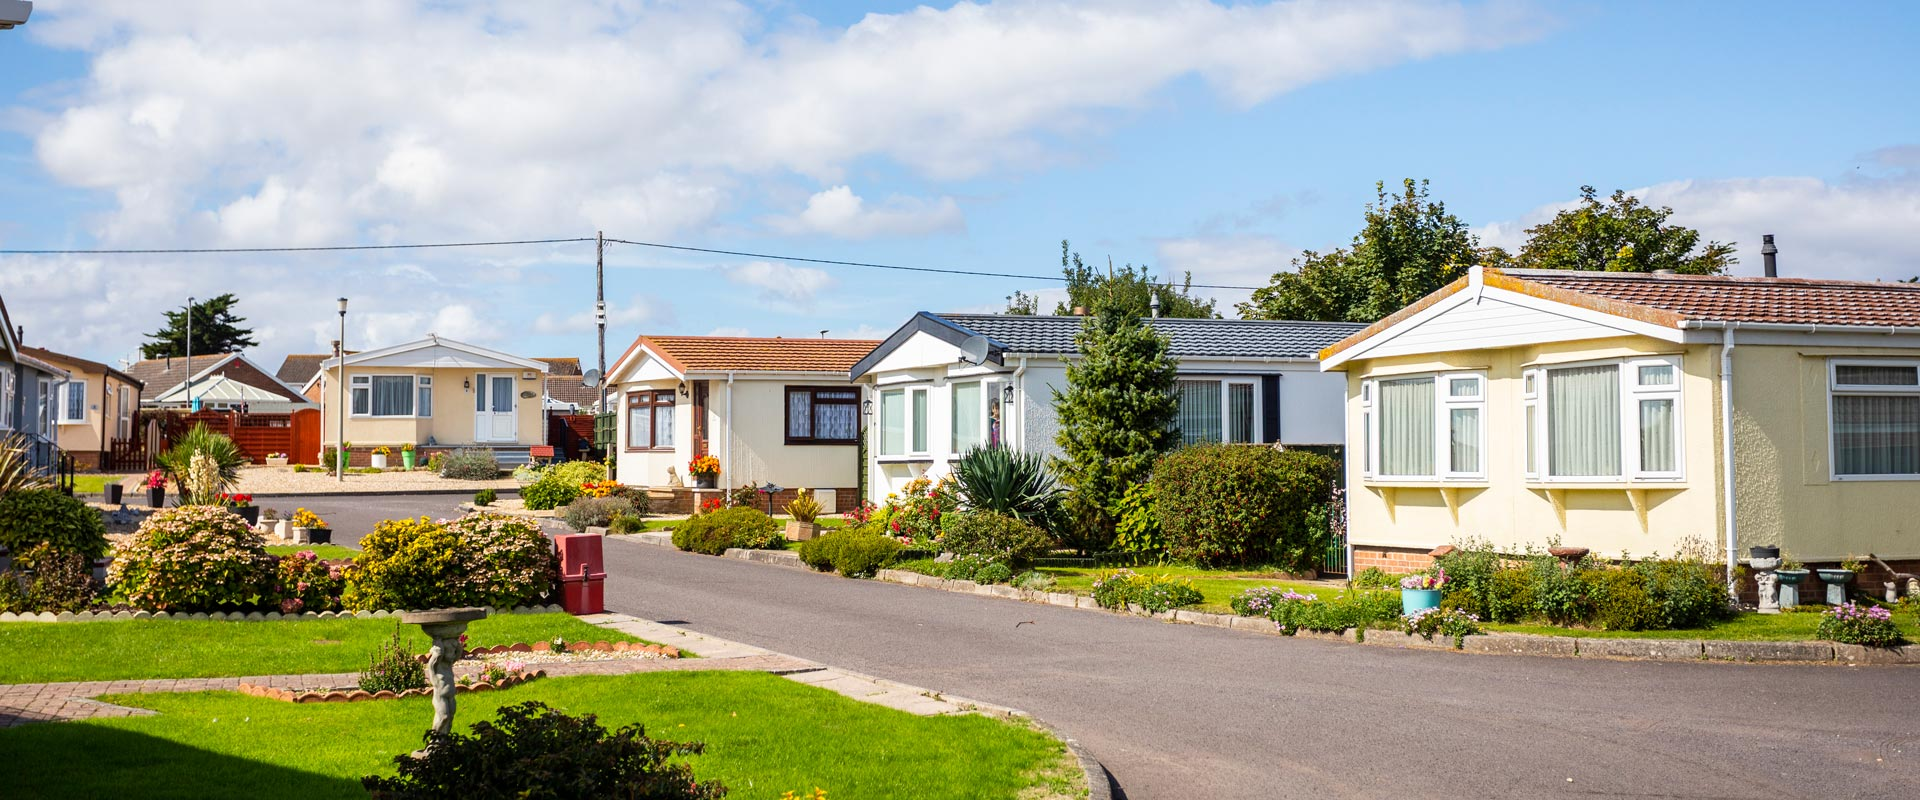 Diamond-Farm-Brean-Court-residential